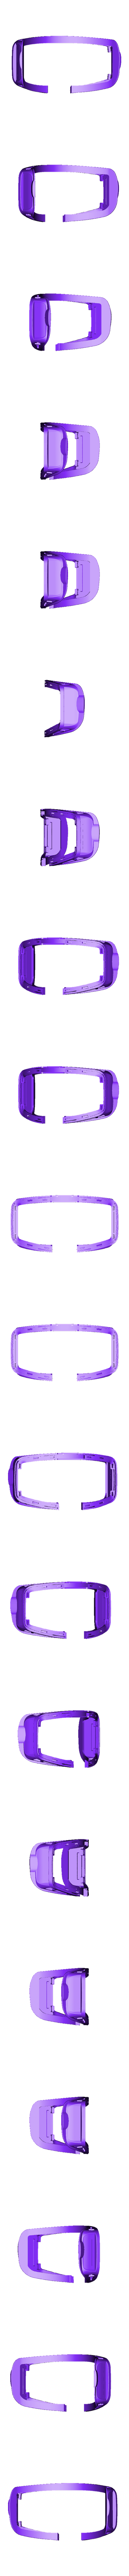 Headband.stl Download free STL file Oculus Rift DK2 • 3D printing object, indigo4